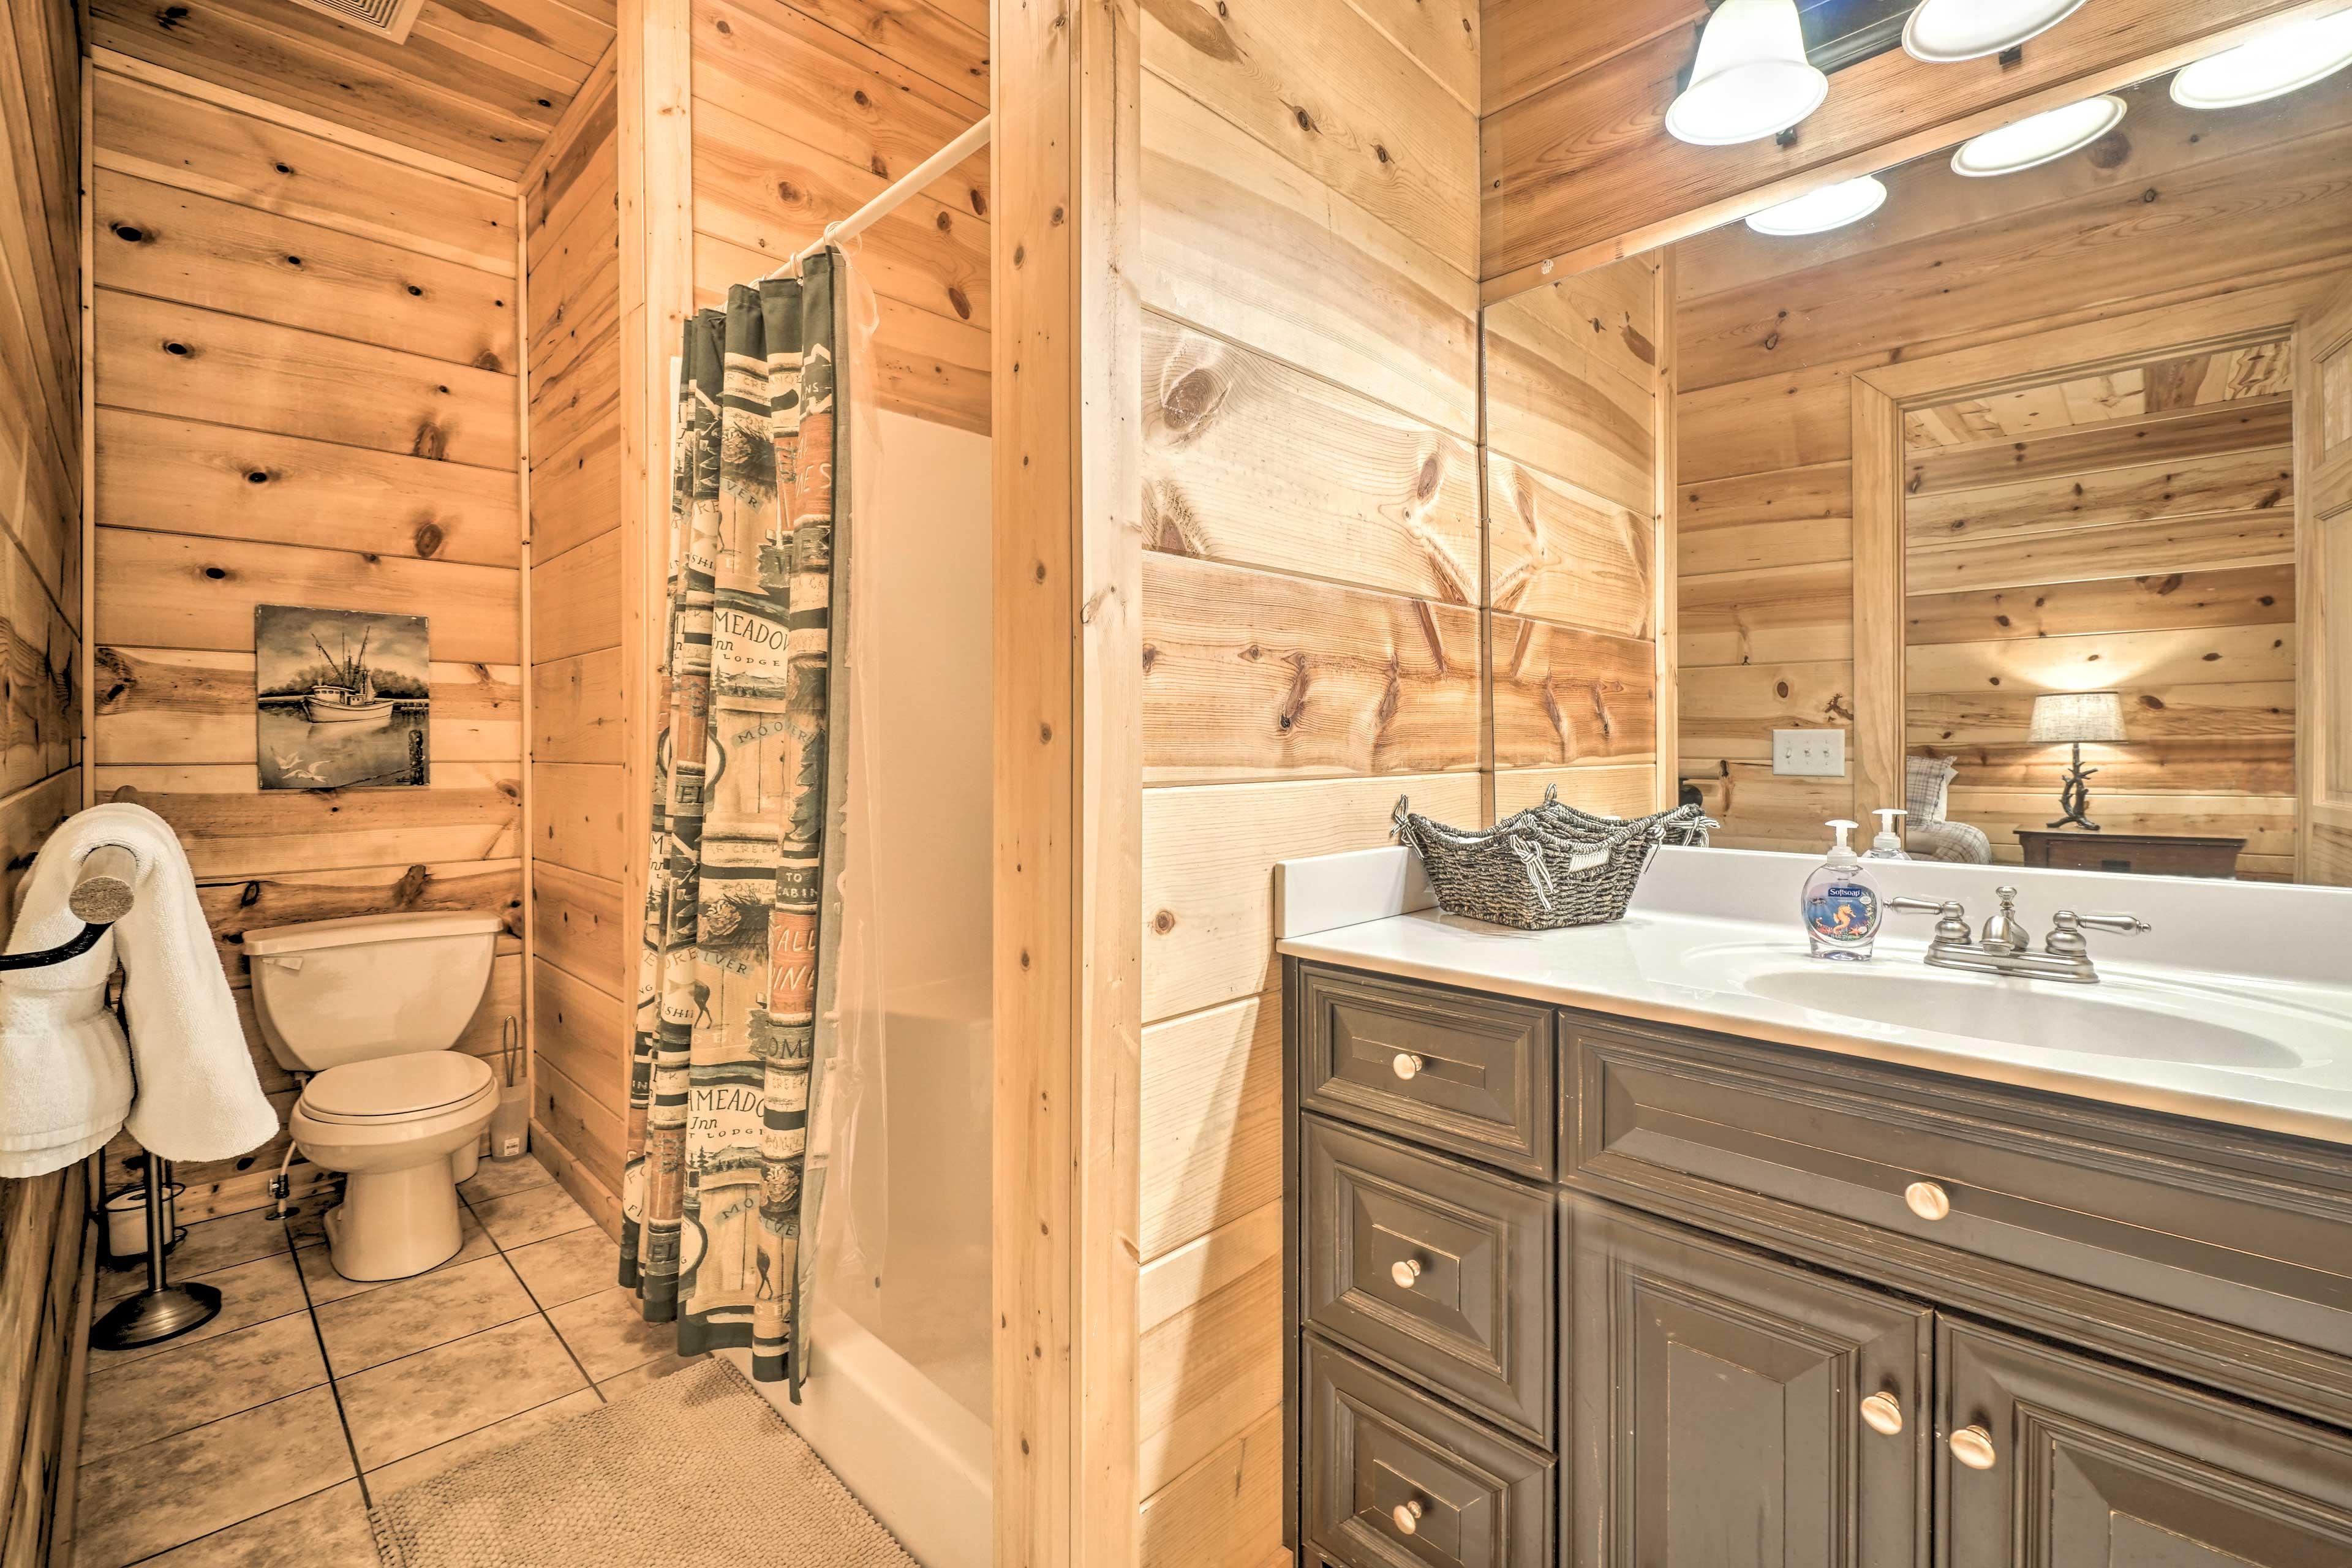 The en-suite bathroom features a walk-in shower.